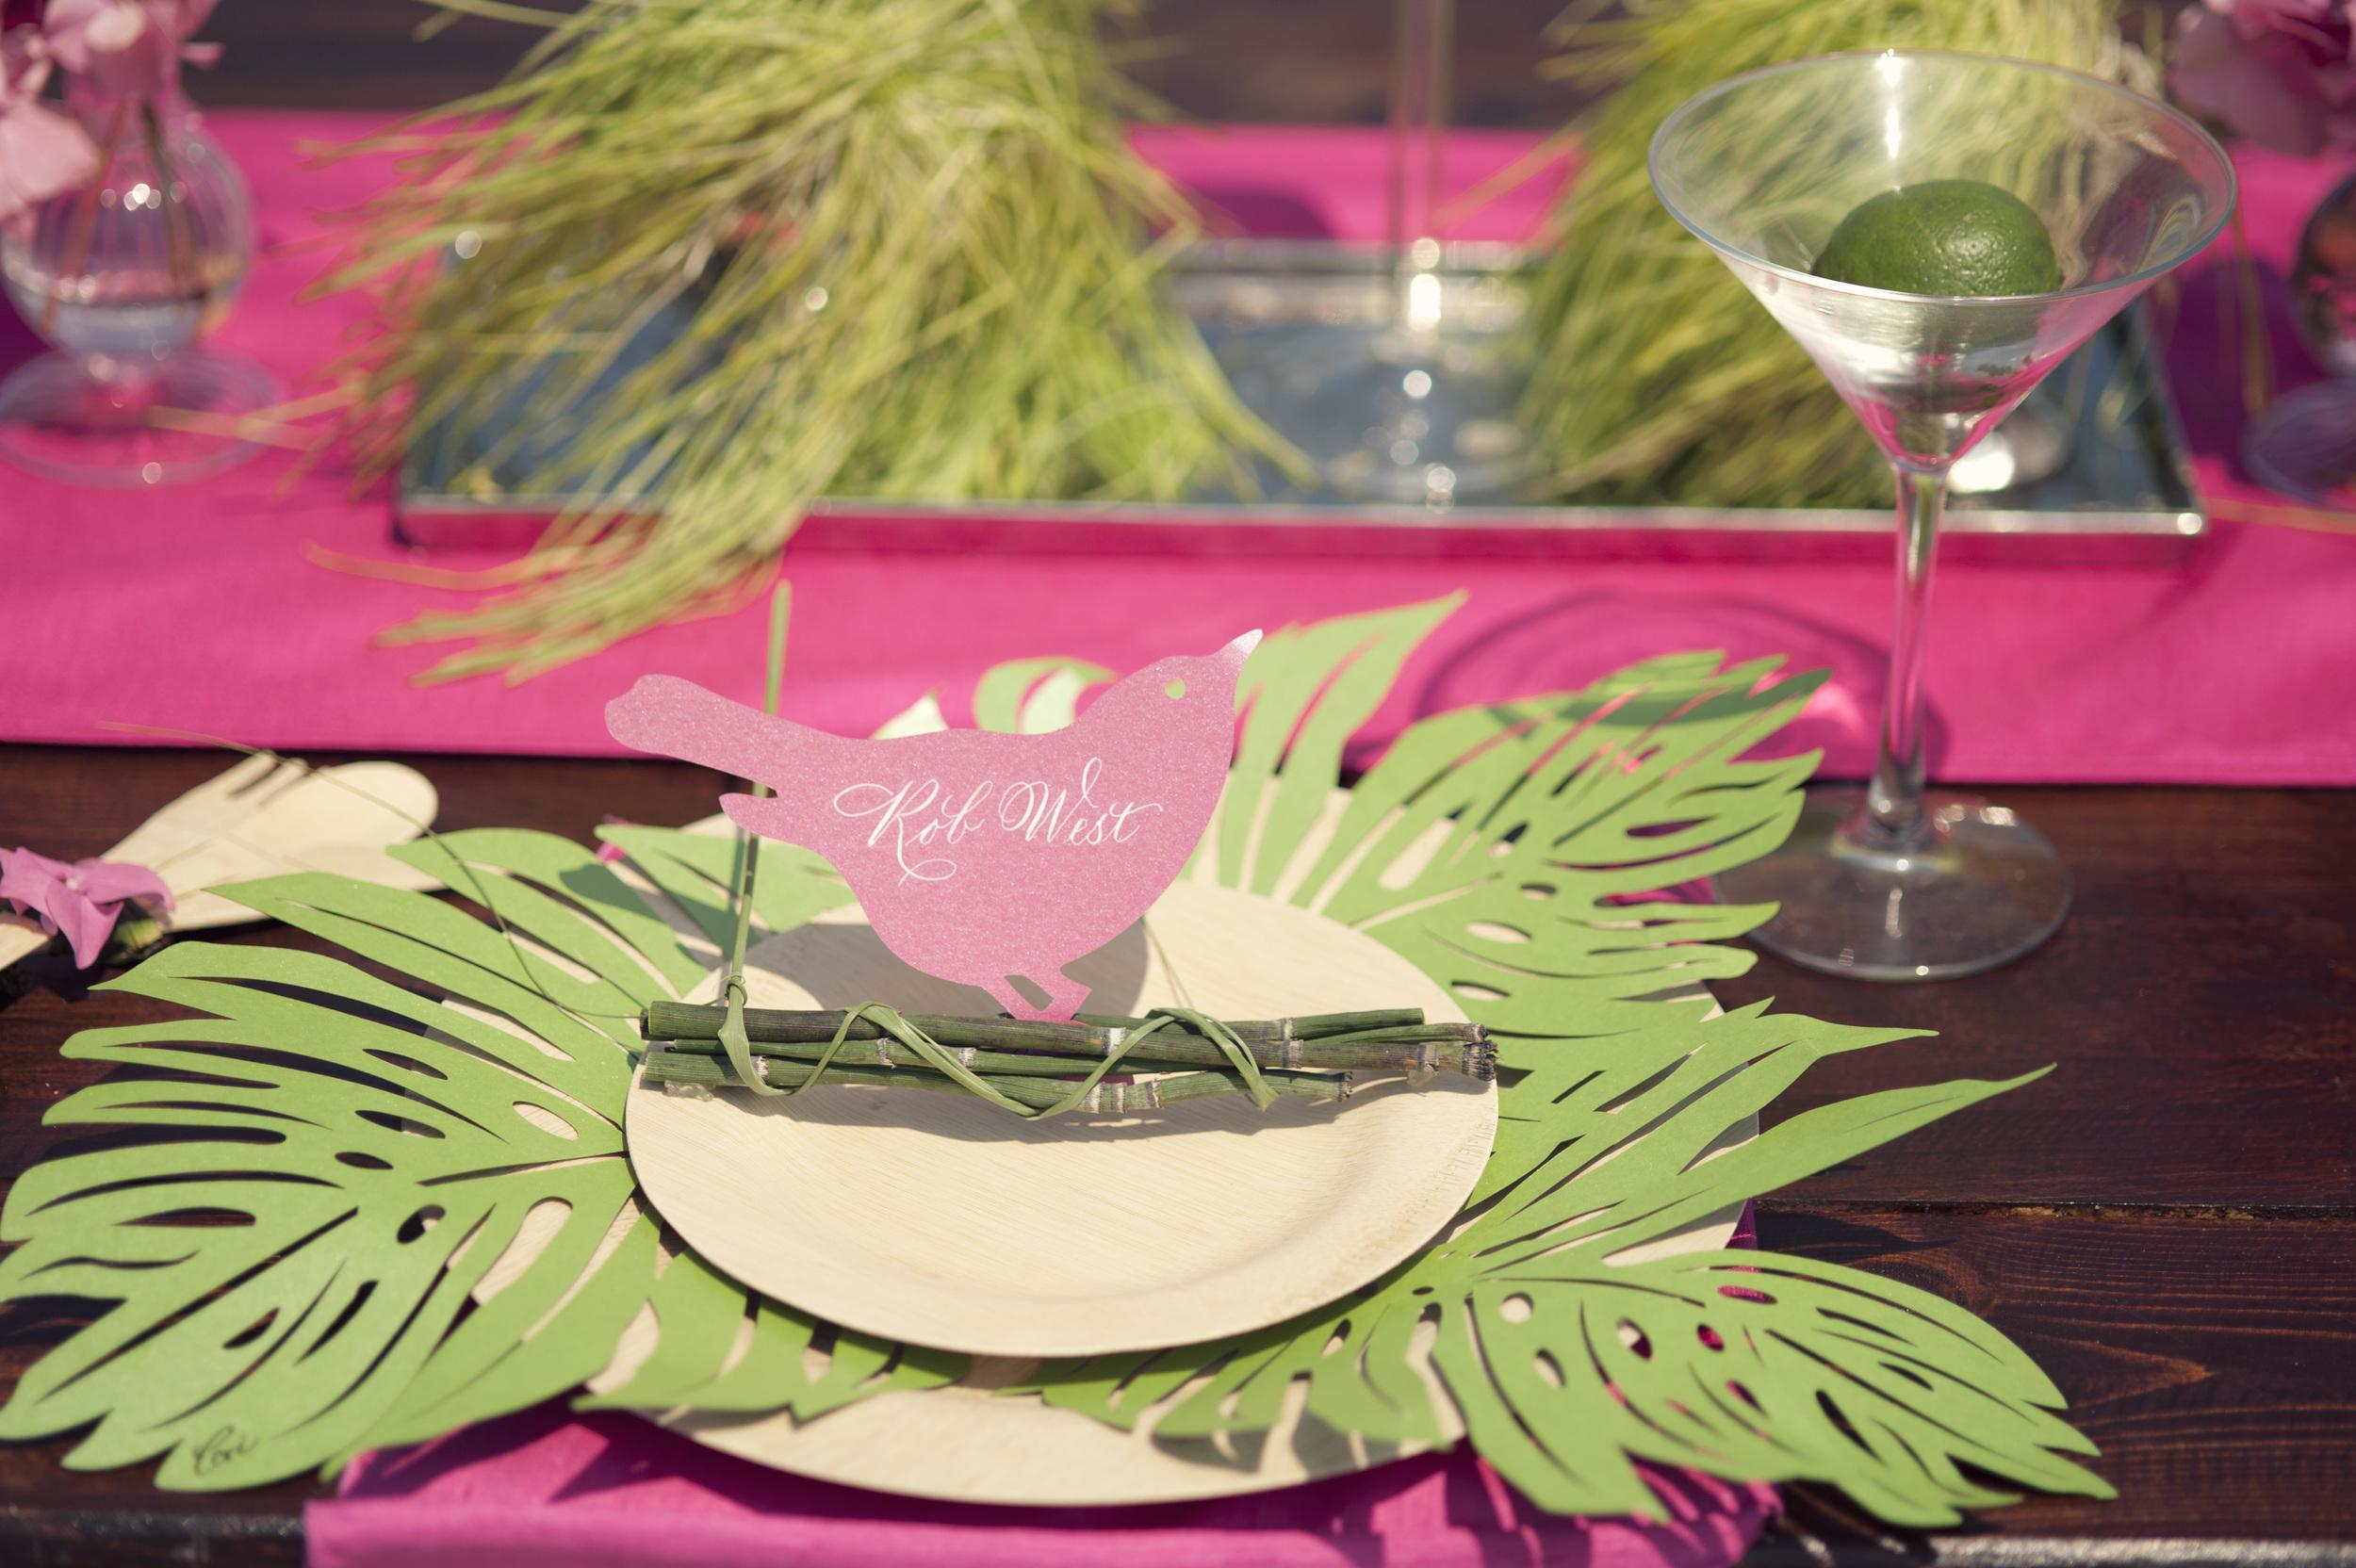 Ceci_New_York_Entertaining_Tabletop_Placemats_Palm_Leaf_Green_Style_Design_Lasercut_Entertaining_Lifestyle_2.jpg